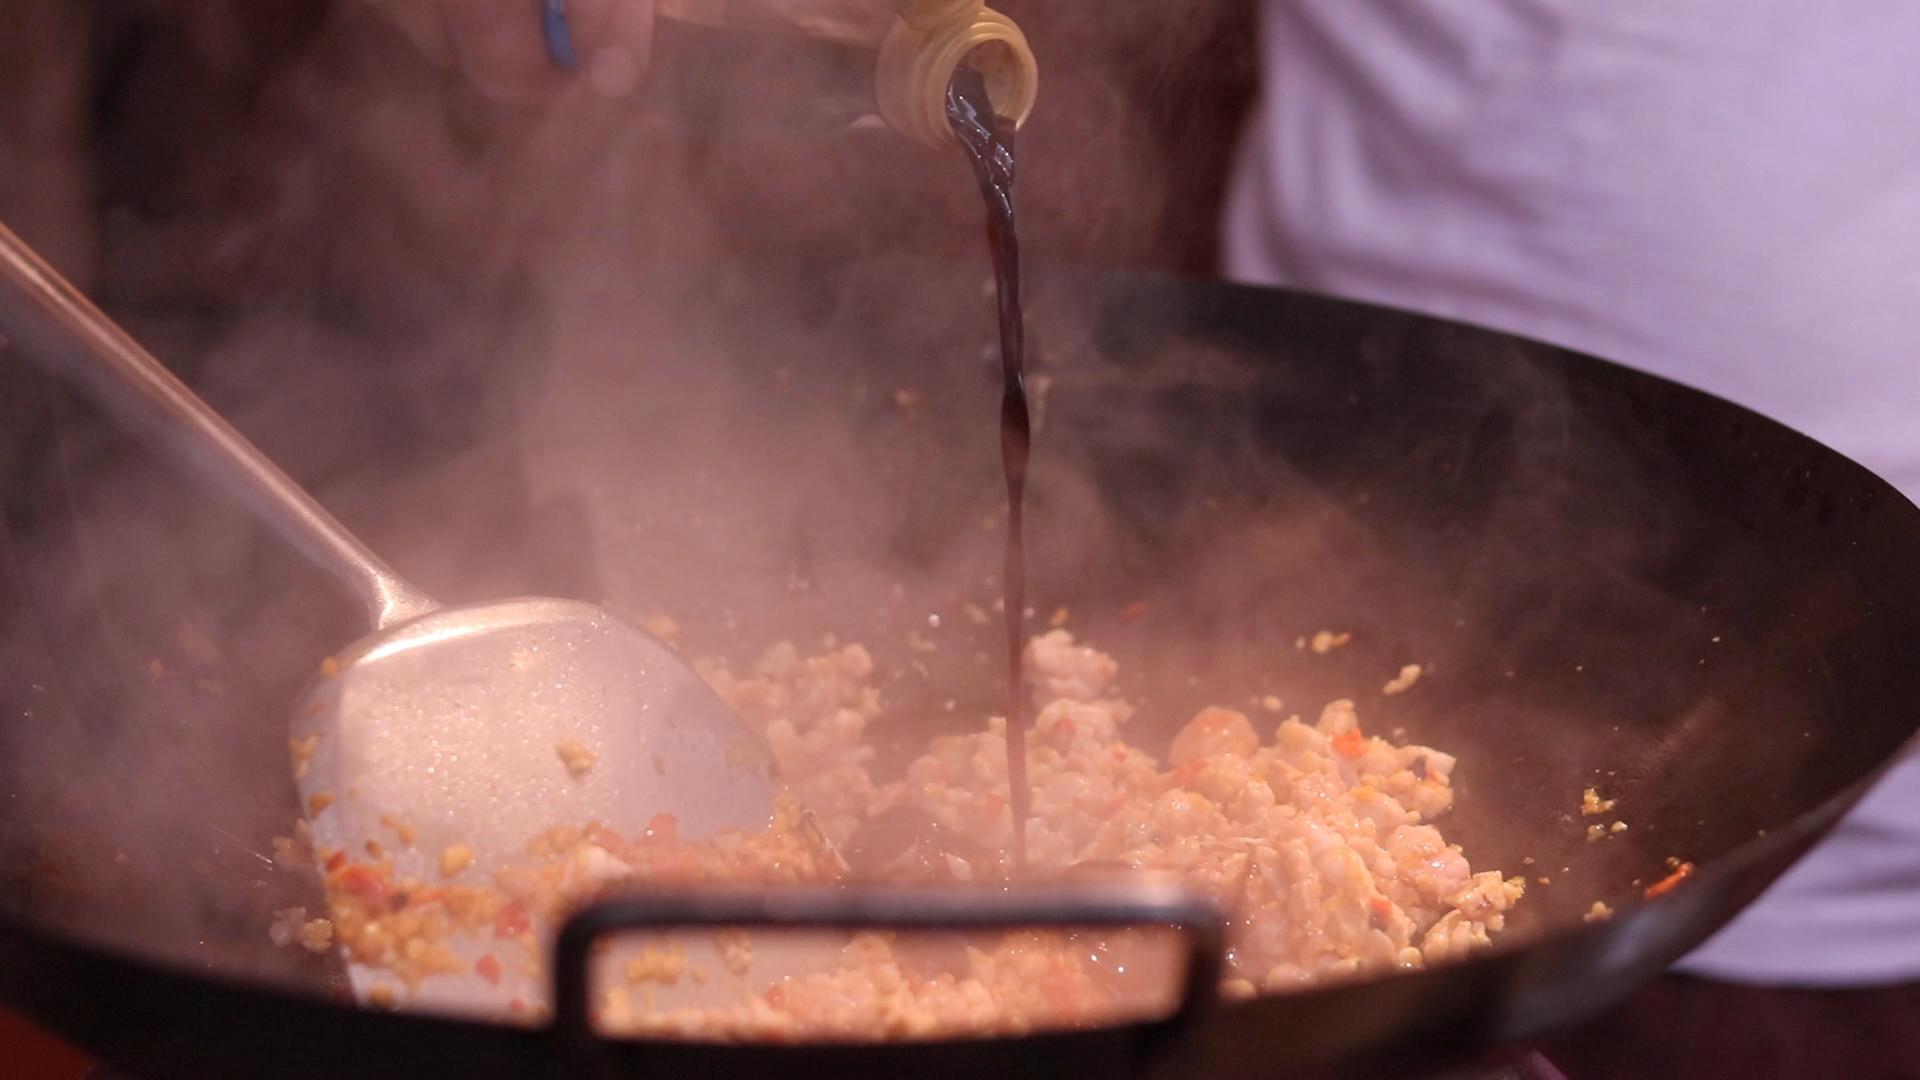 Soy-Sauce-Fish-Sauce-Oyster-Sauce-Pad-Kra-Prao